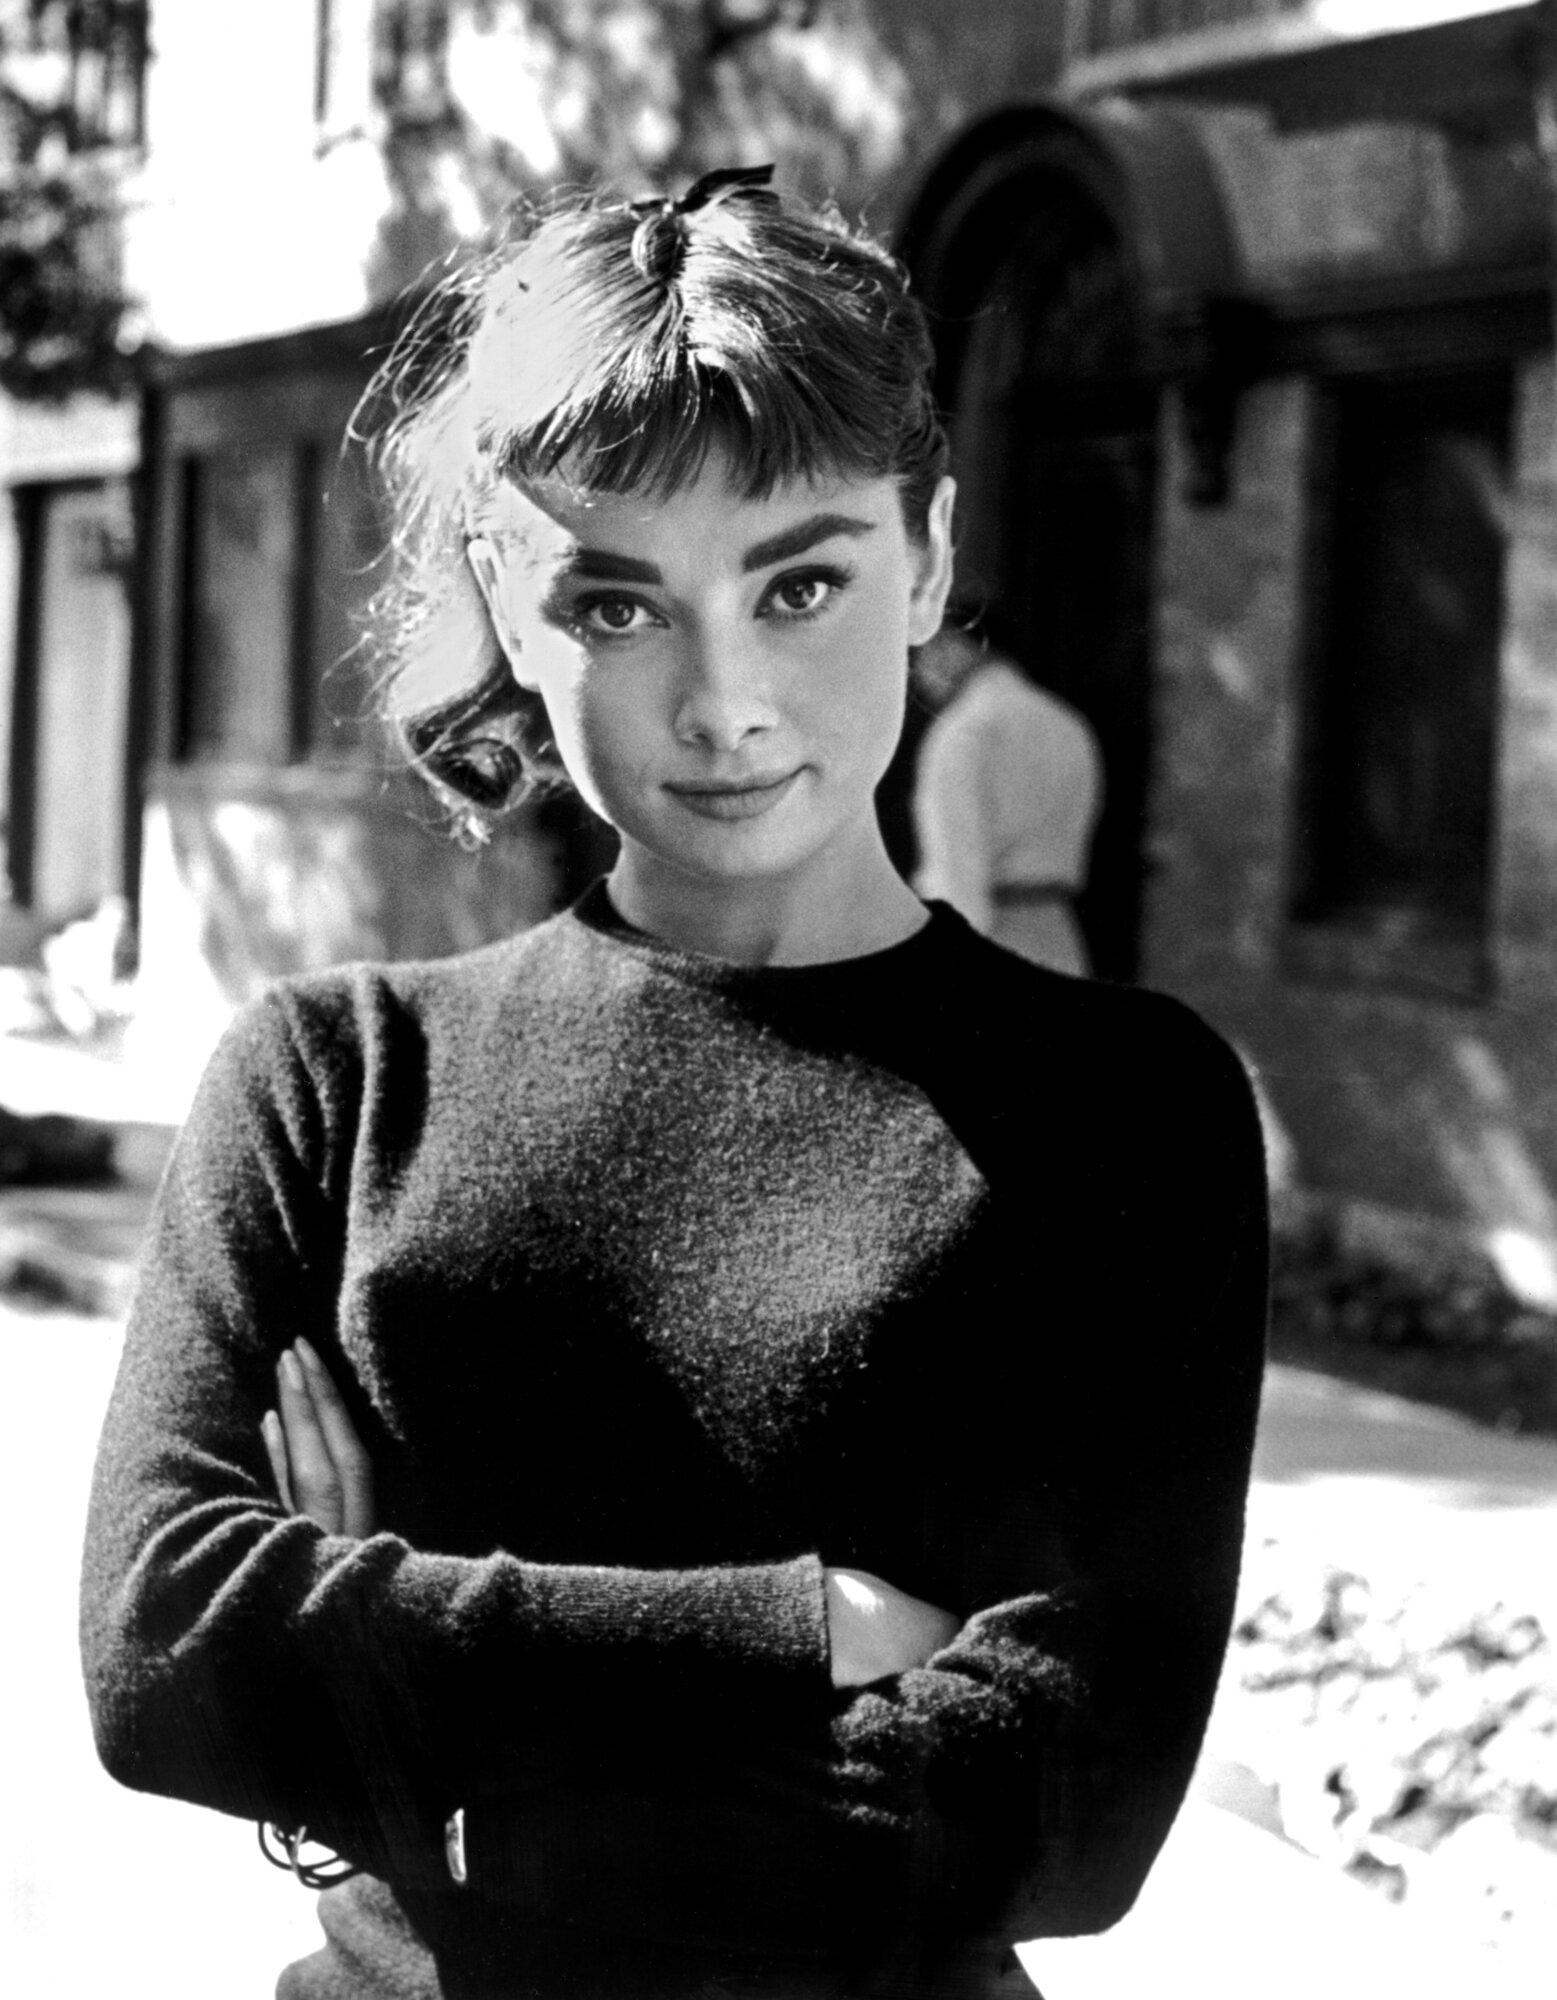 Audrey Hepburn1954 © 2000 Mark Shaw